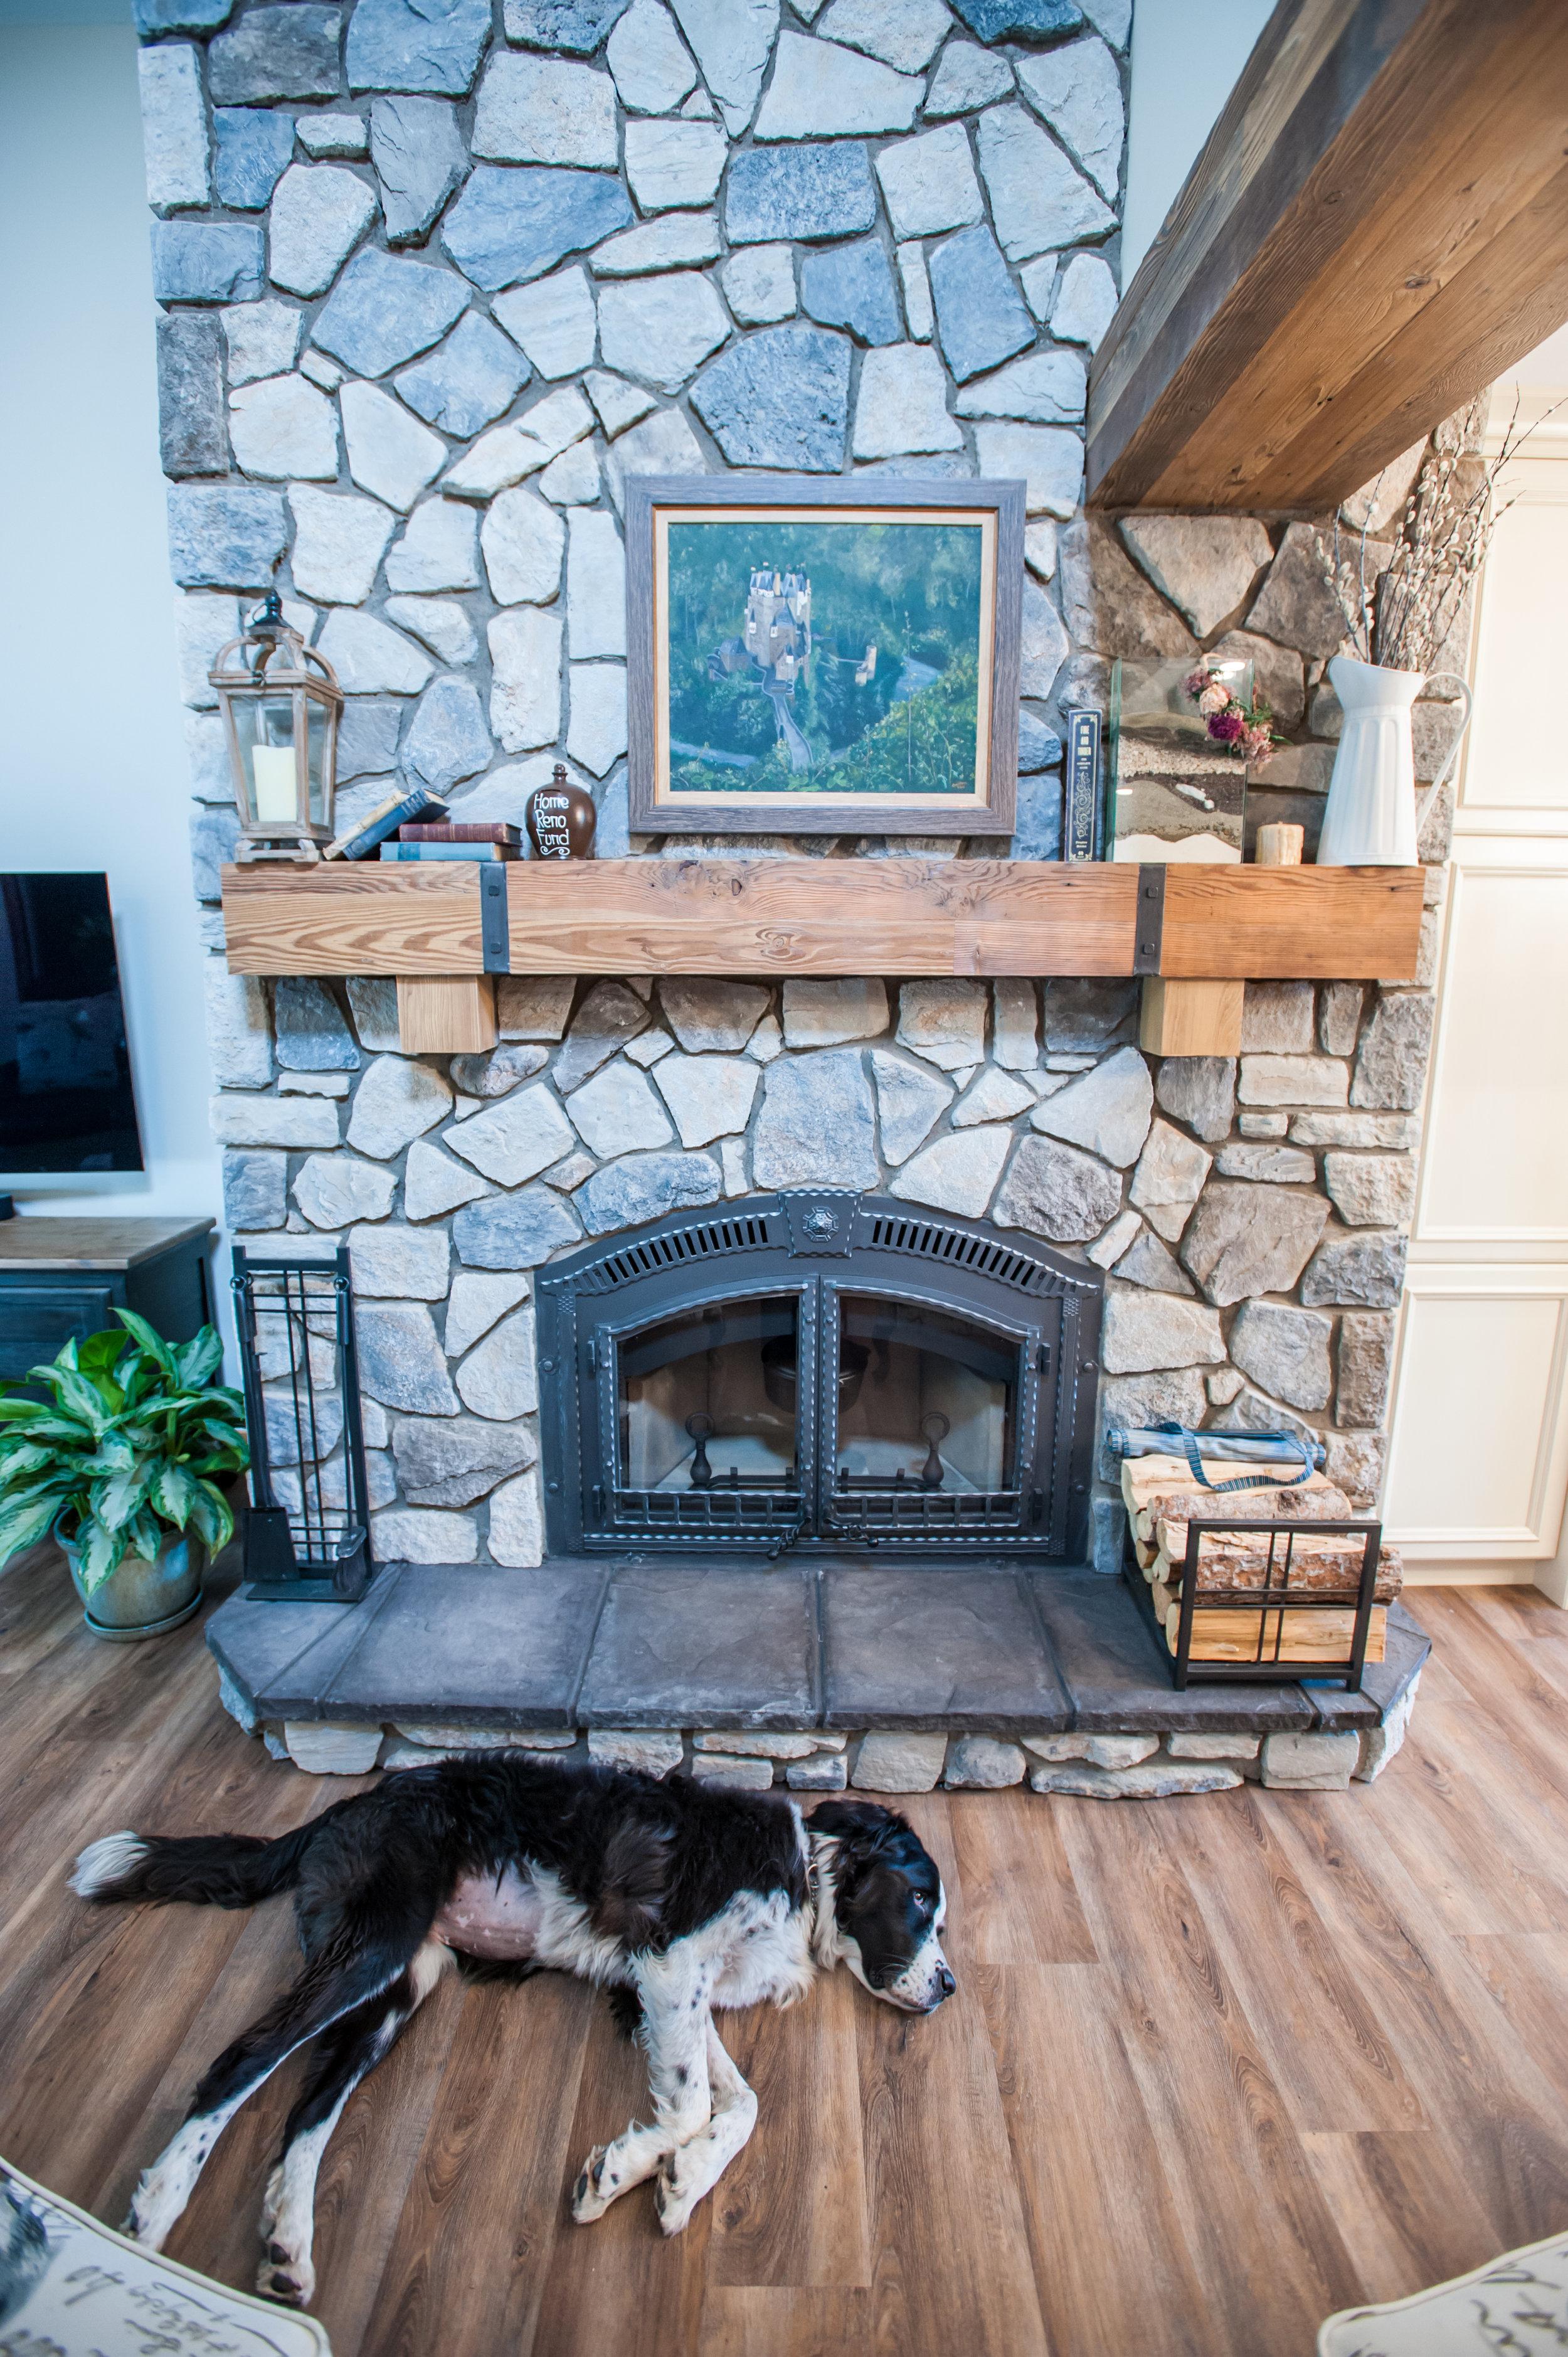 doggy_sleeping_fireplace